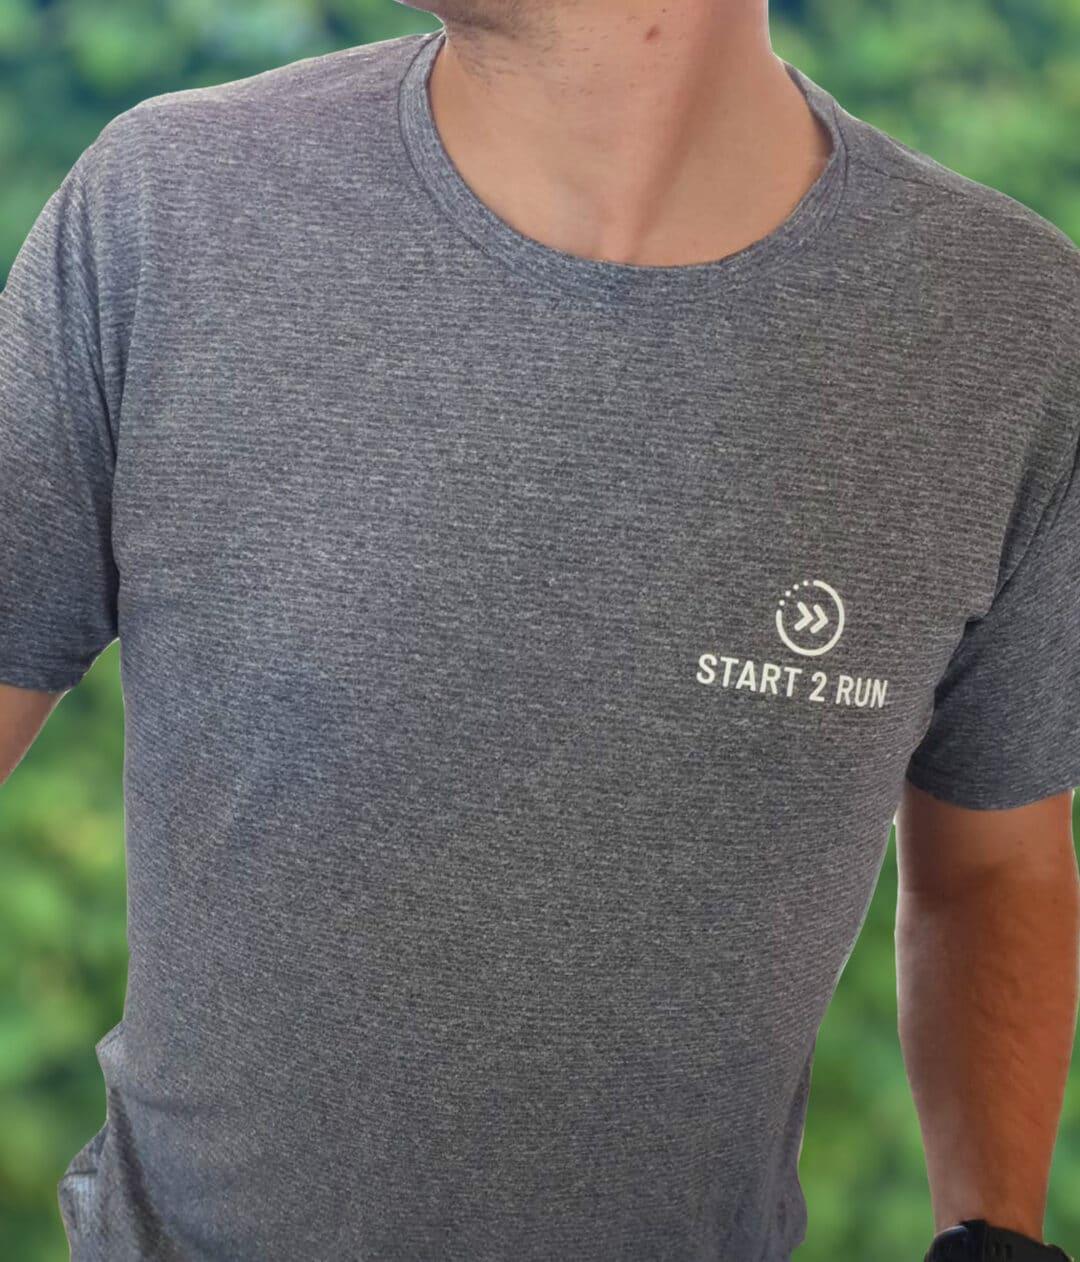 Start 2 Run Tshirt man